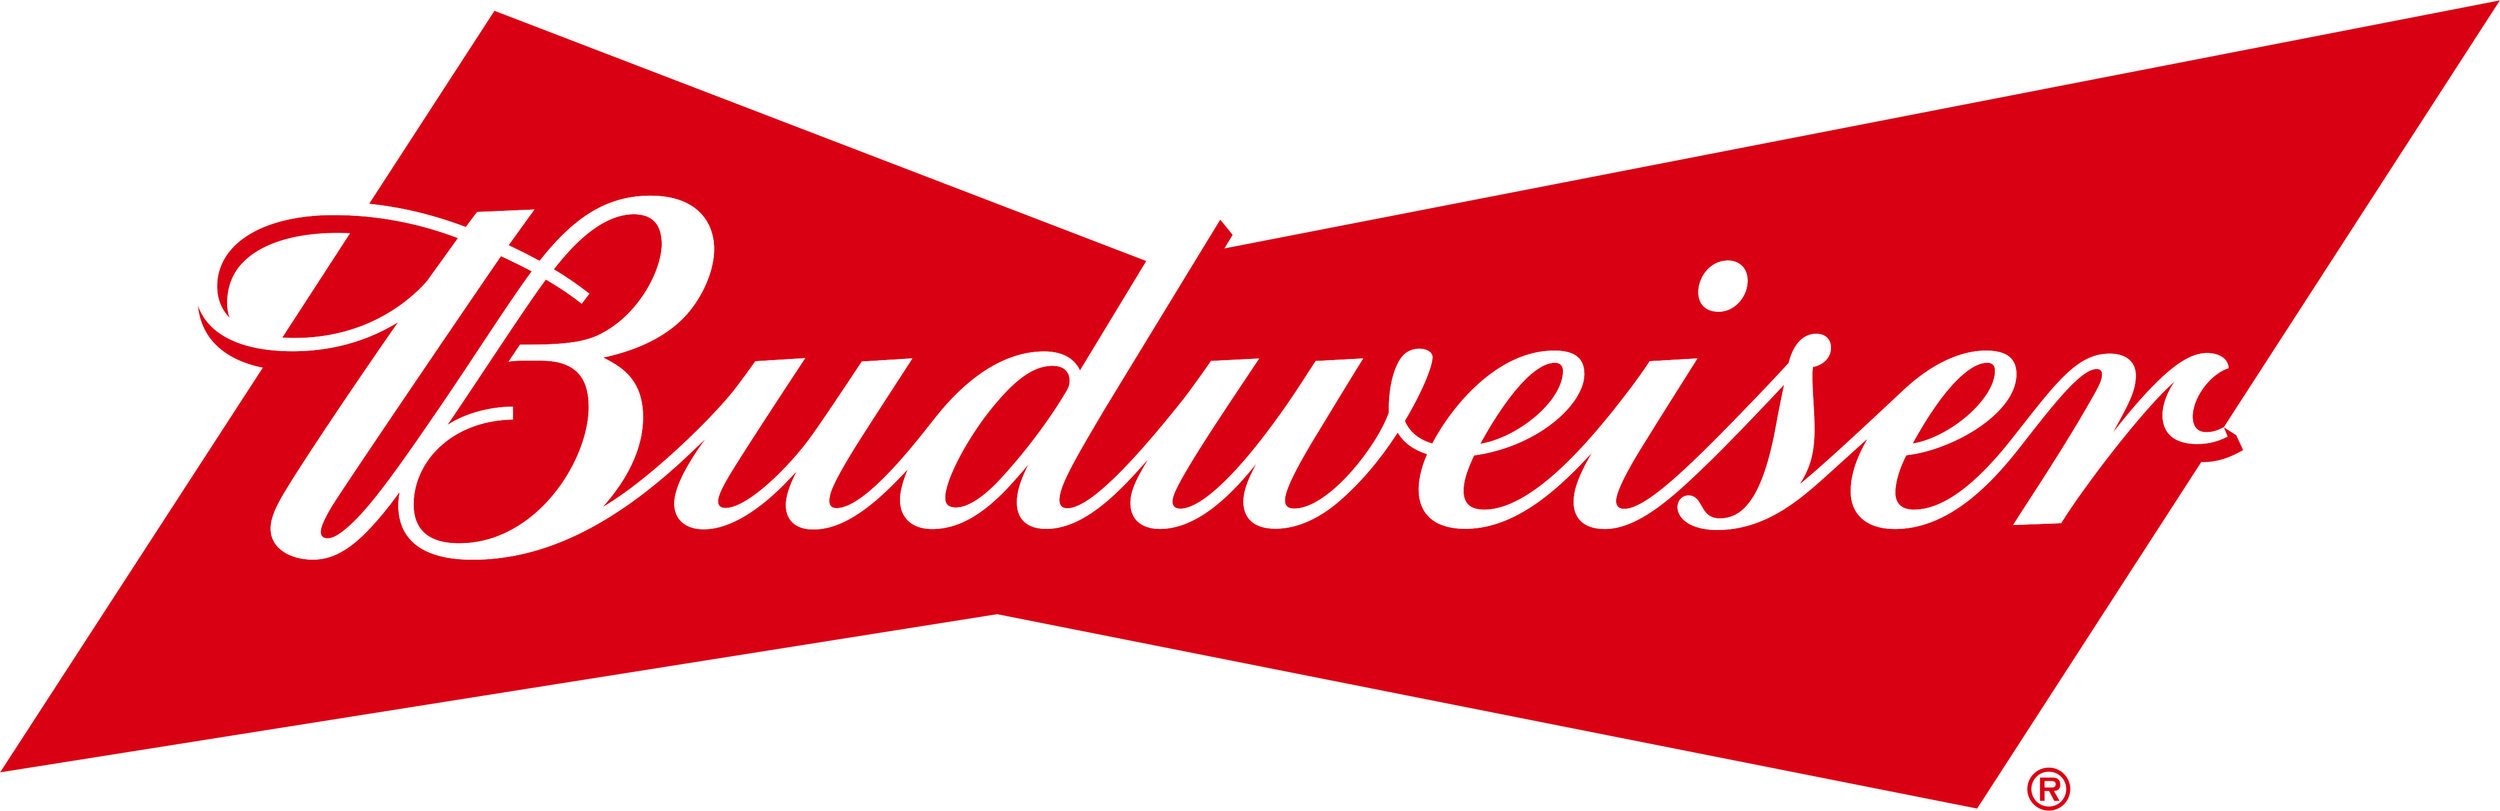 New-Budweiser-Logo-4-29-16 (1).jpg